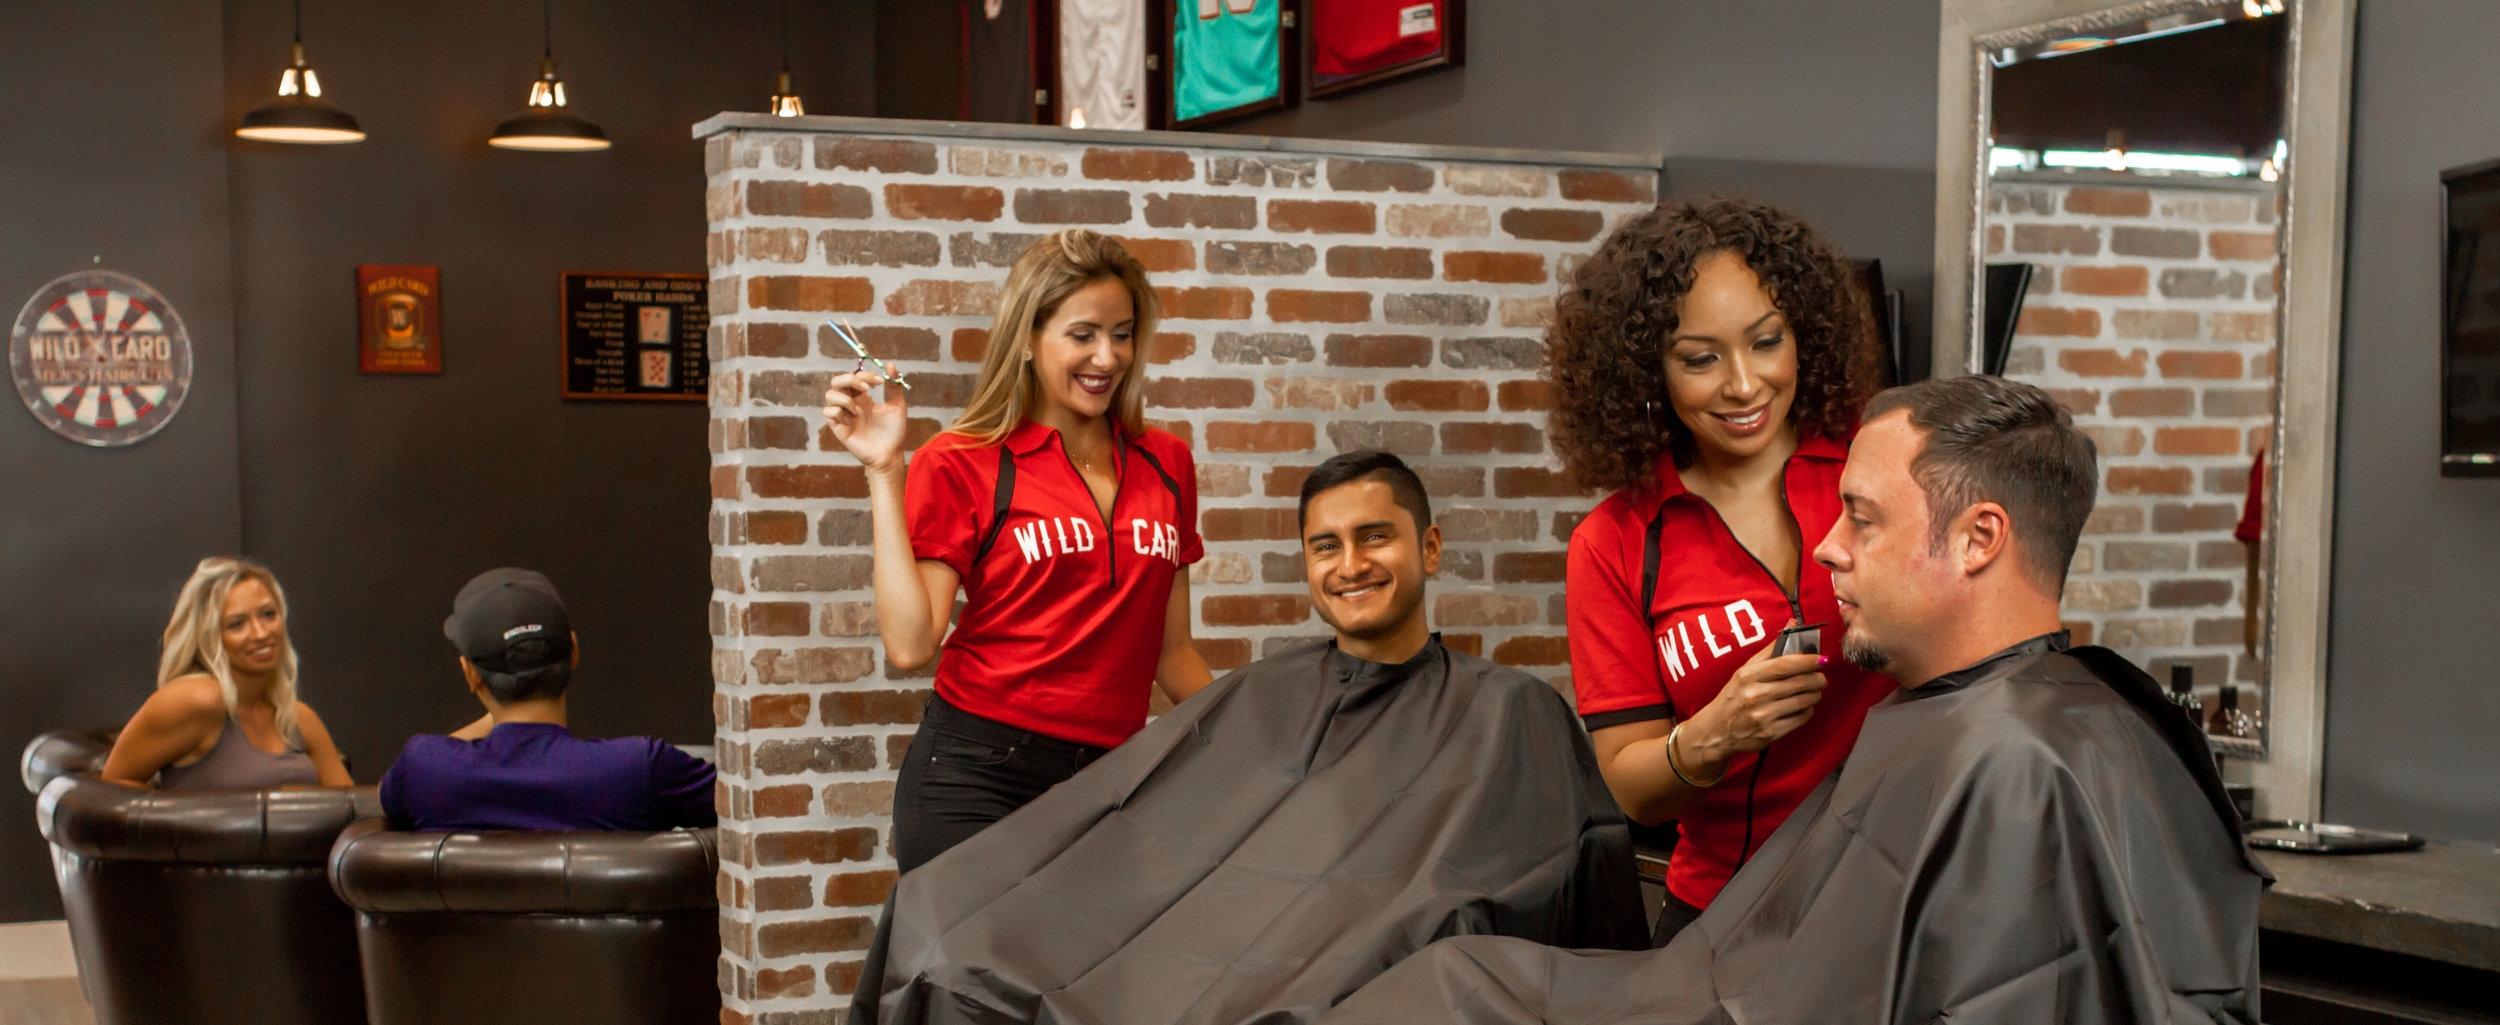 barbershop mens haircuts mens salon